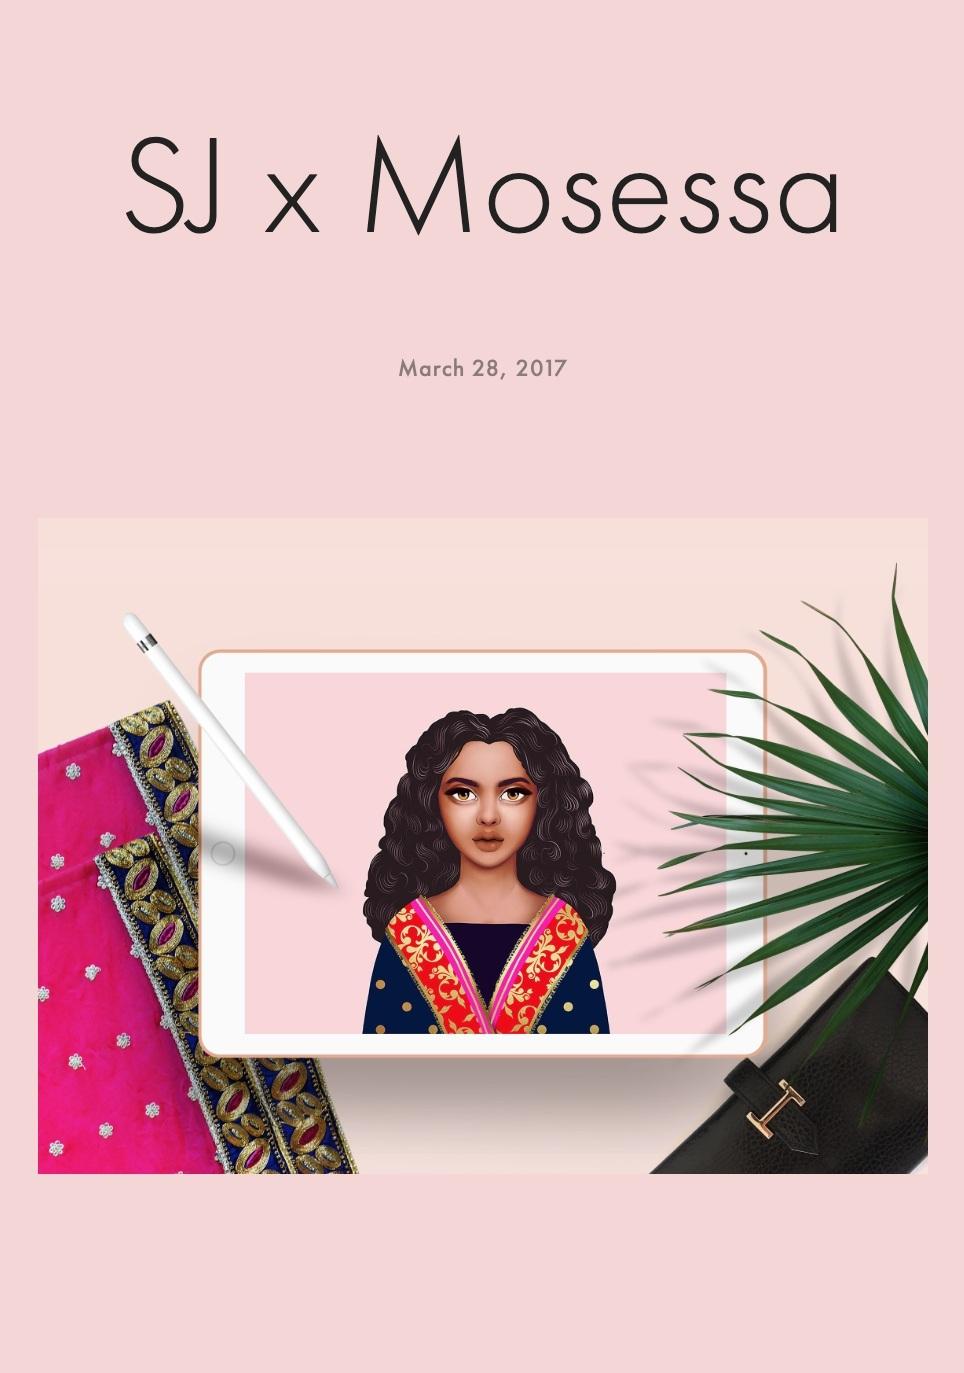 INTERVIEW: SJ x MOSESSA